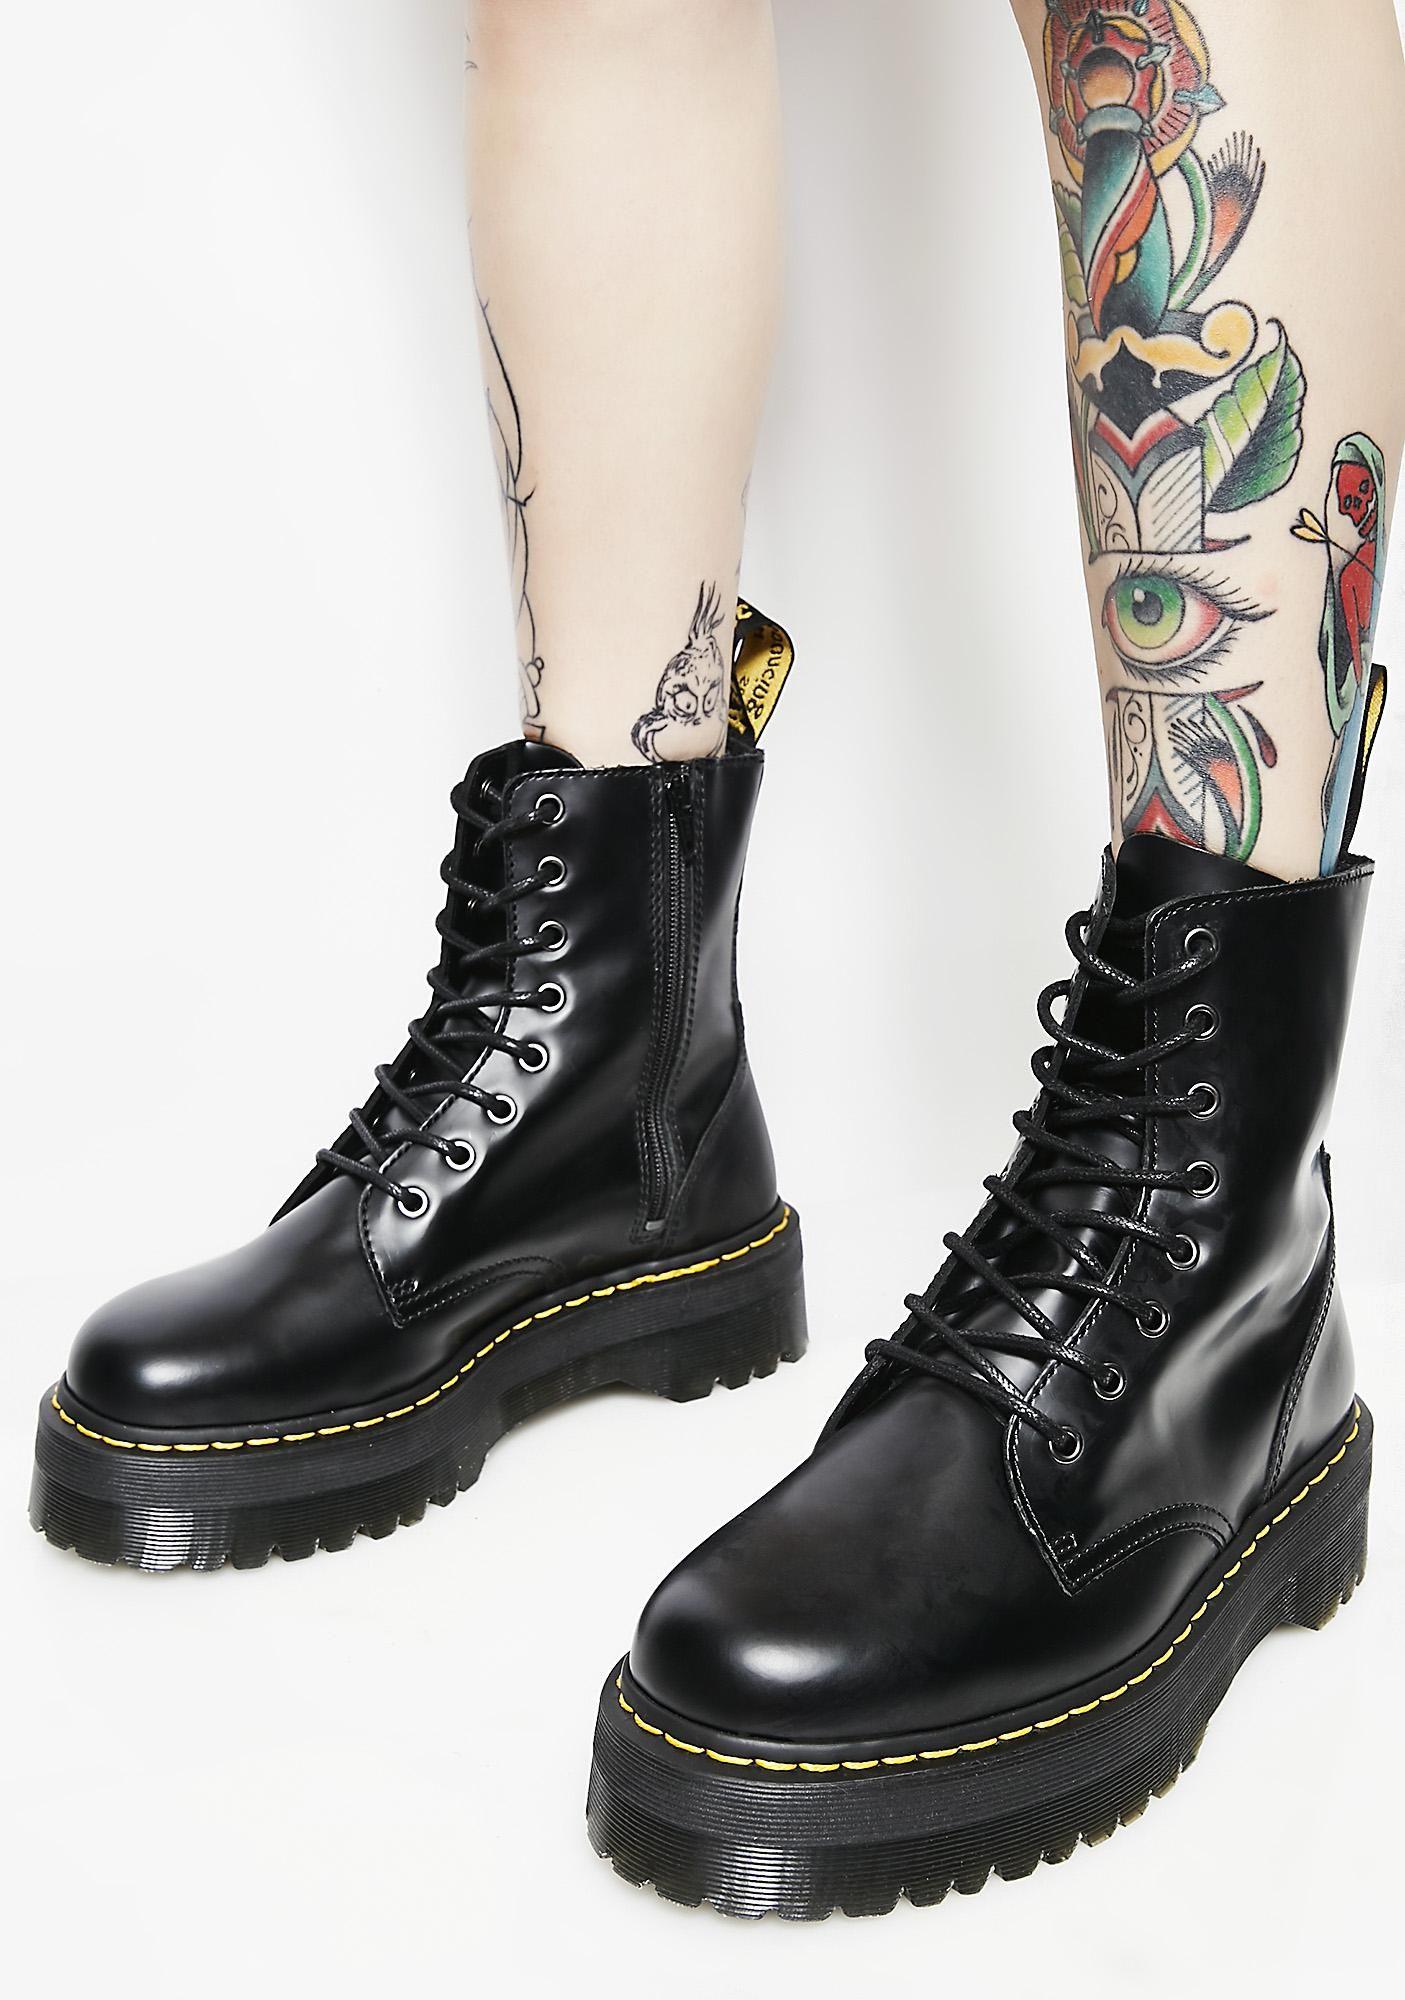 eb9a93199a17 Dr. Martens Jadon 8 Eye Boots